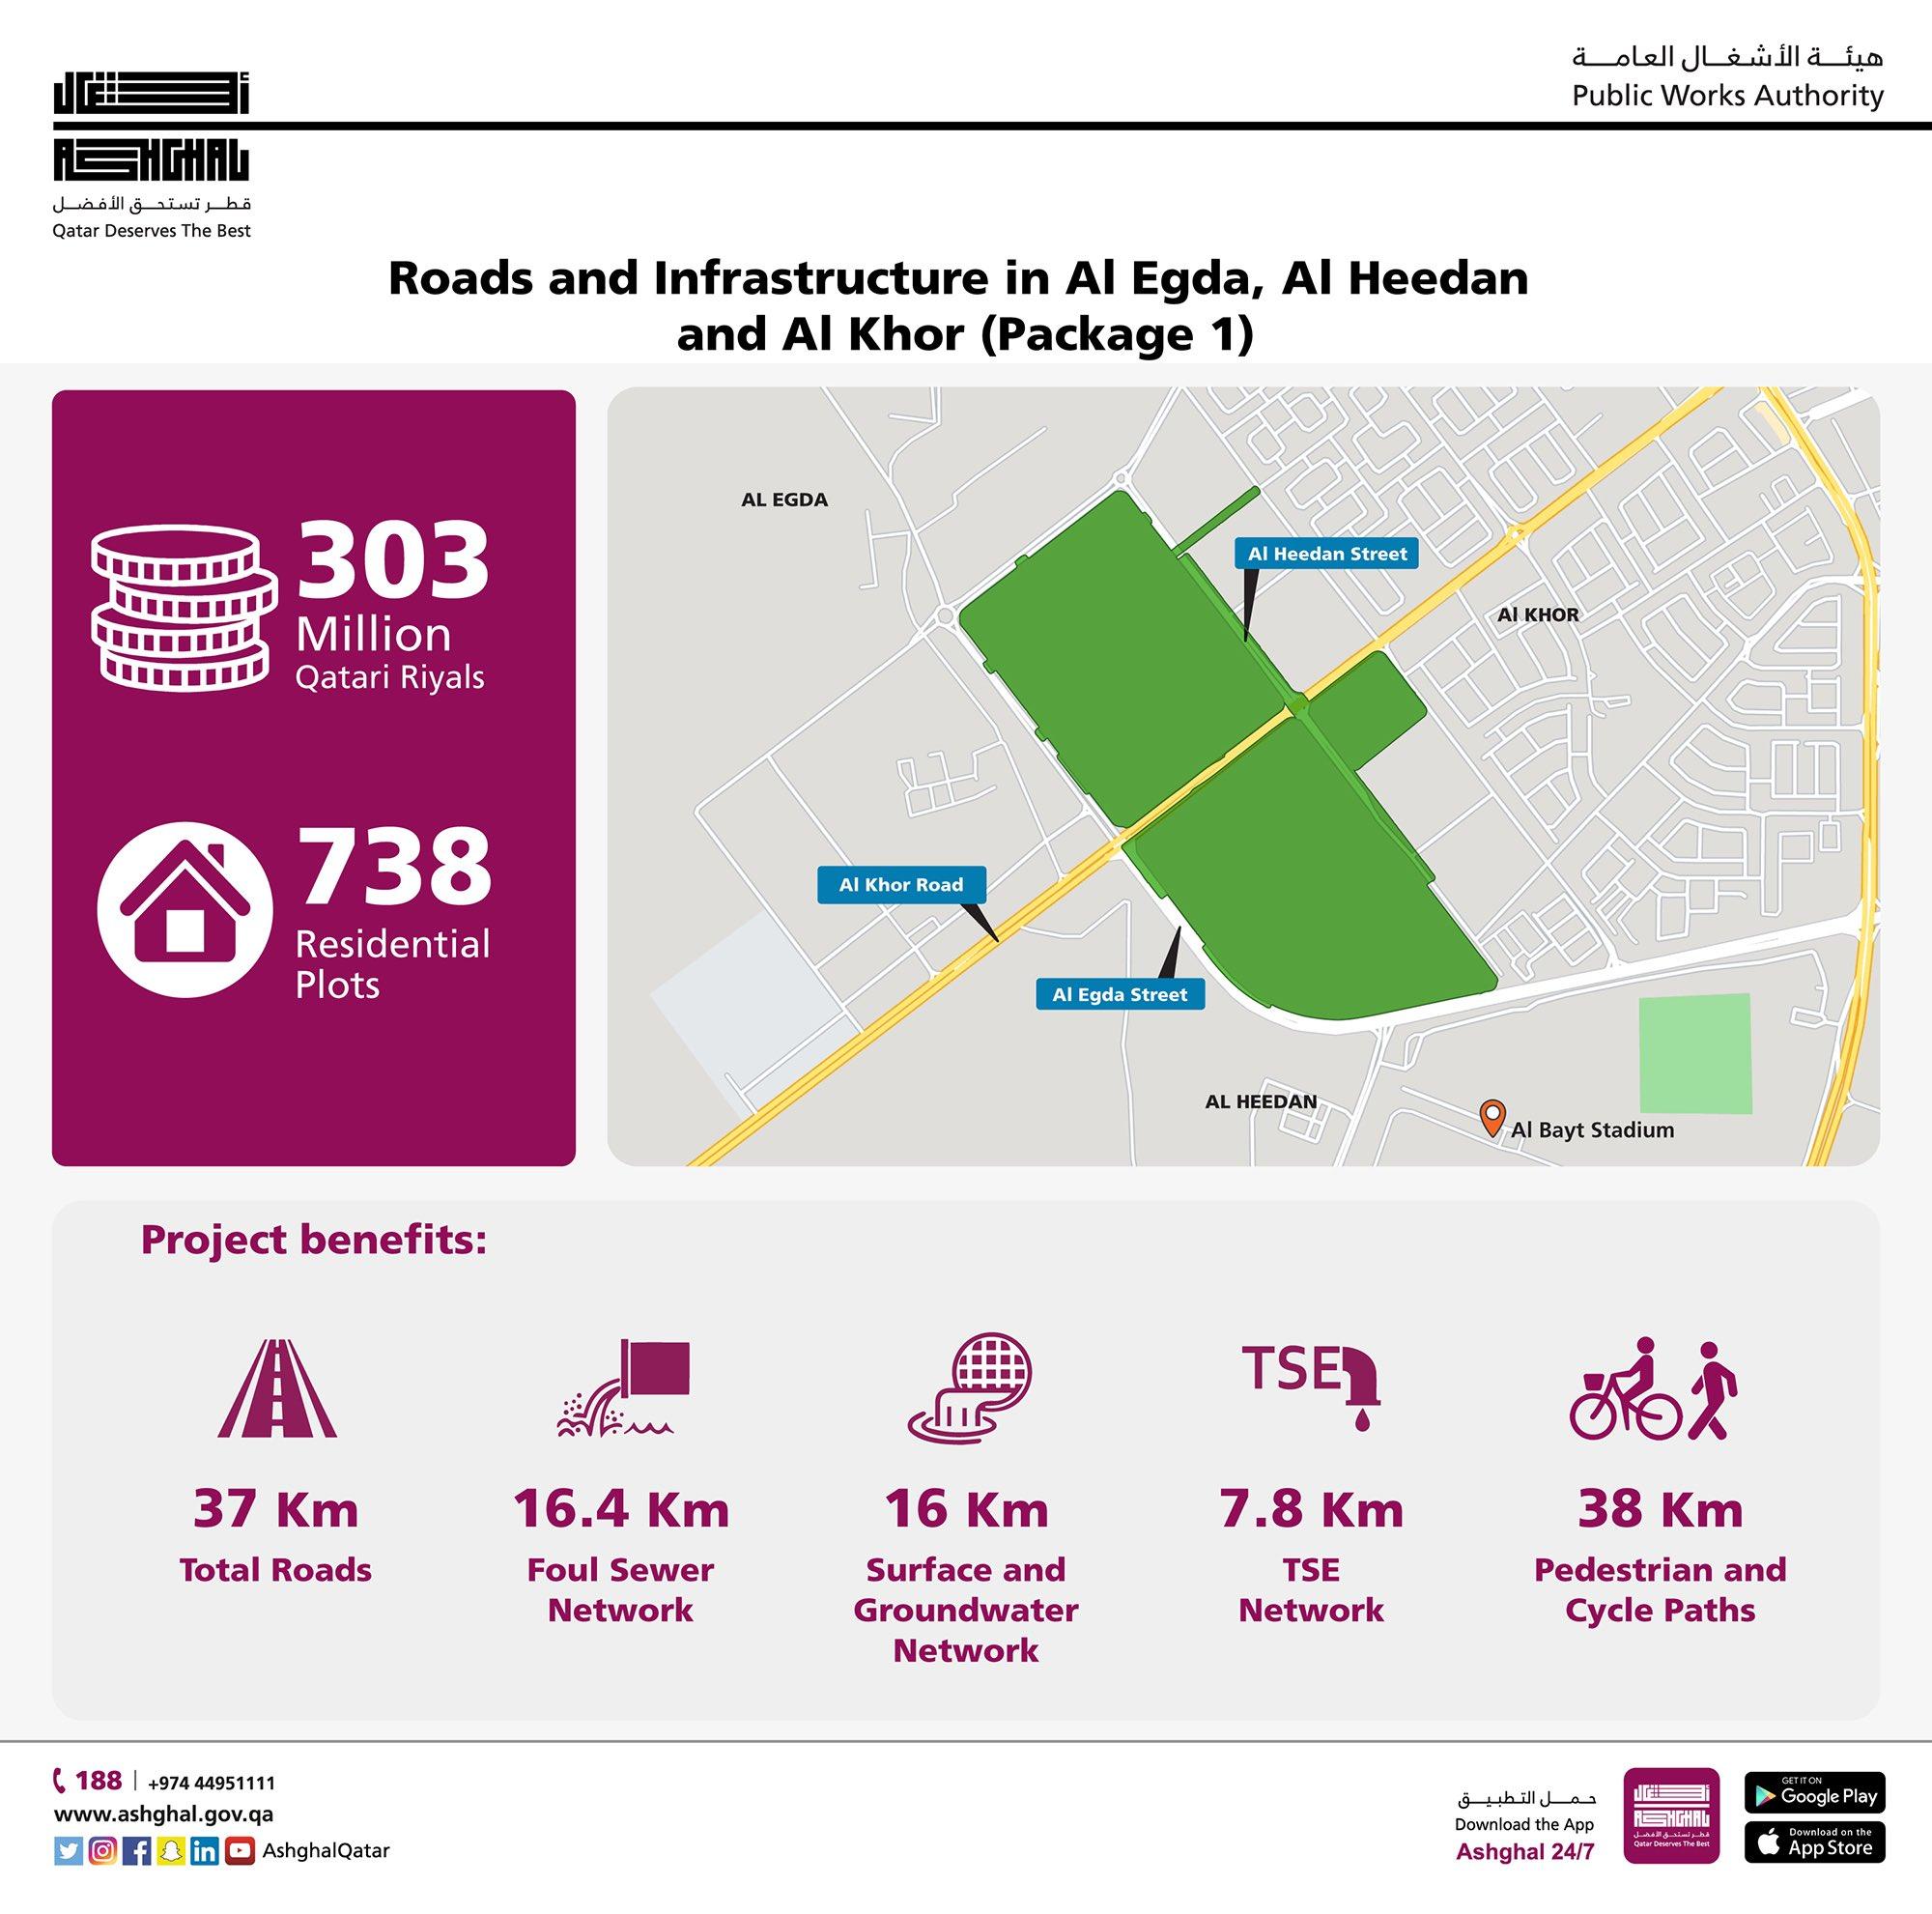 Ashghal starts roads and infrastructure project in Al Egda Al Heedan and Al Khor